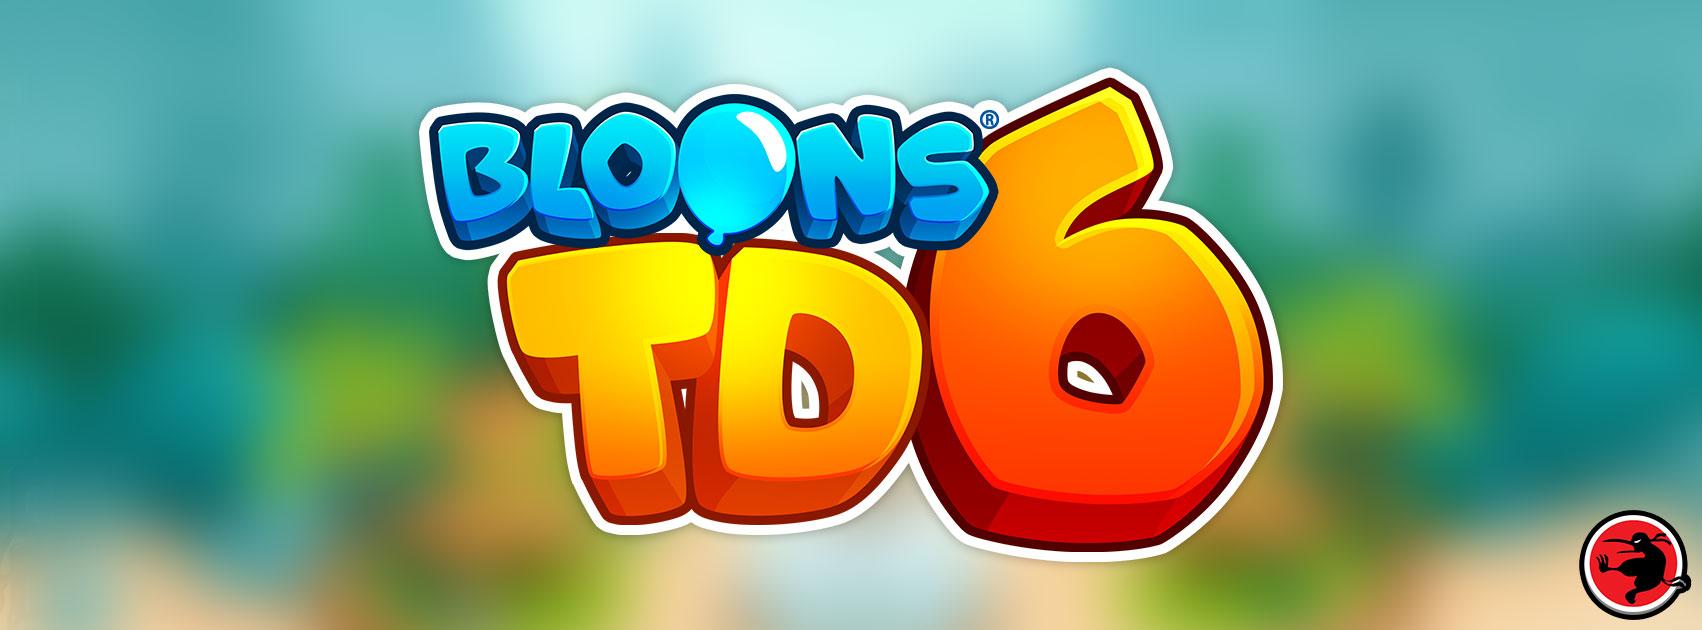 Bloons TD 6   Logopedia   FANDOM powered by Wikia